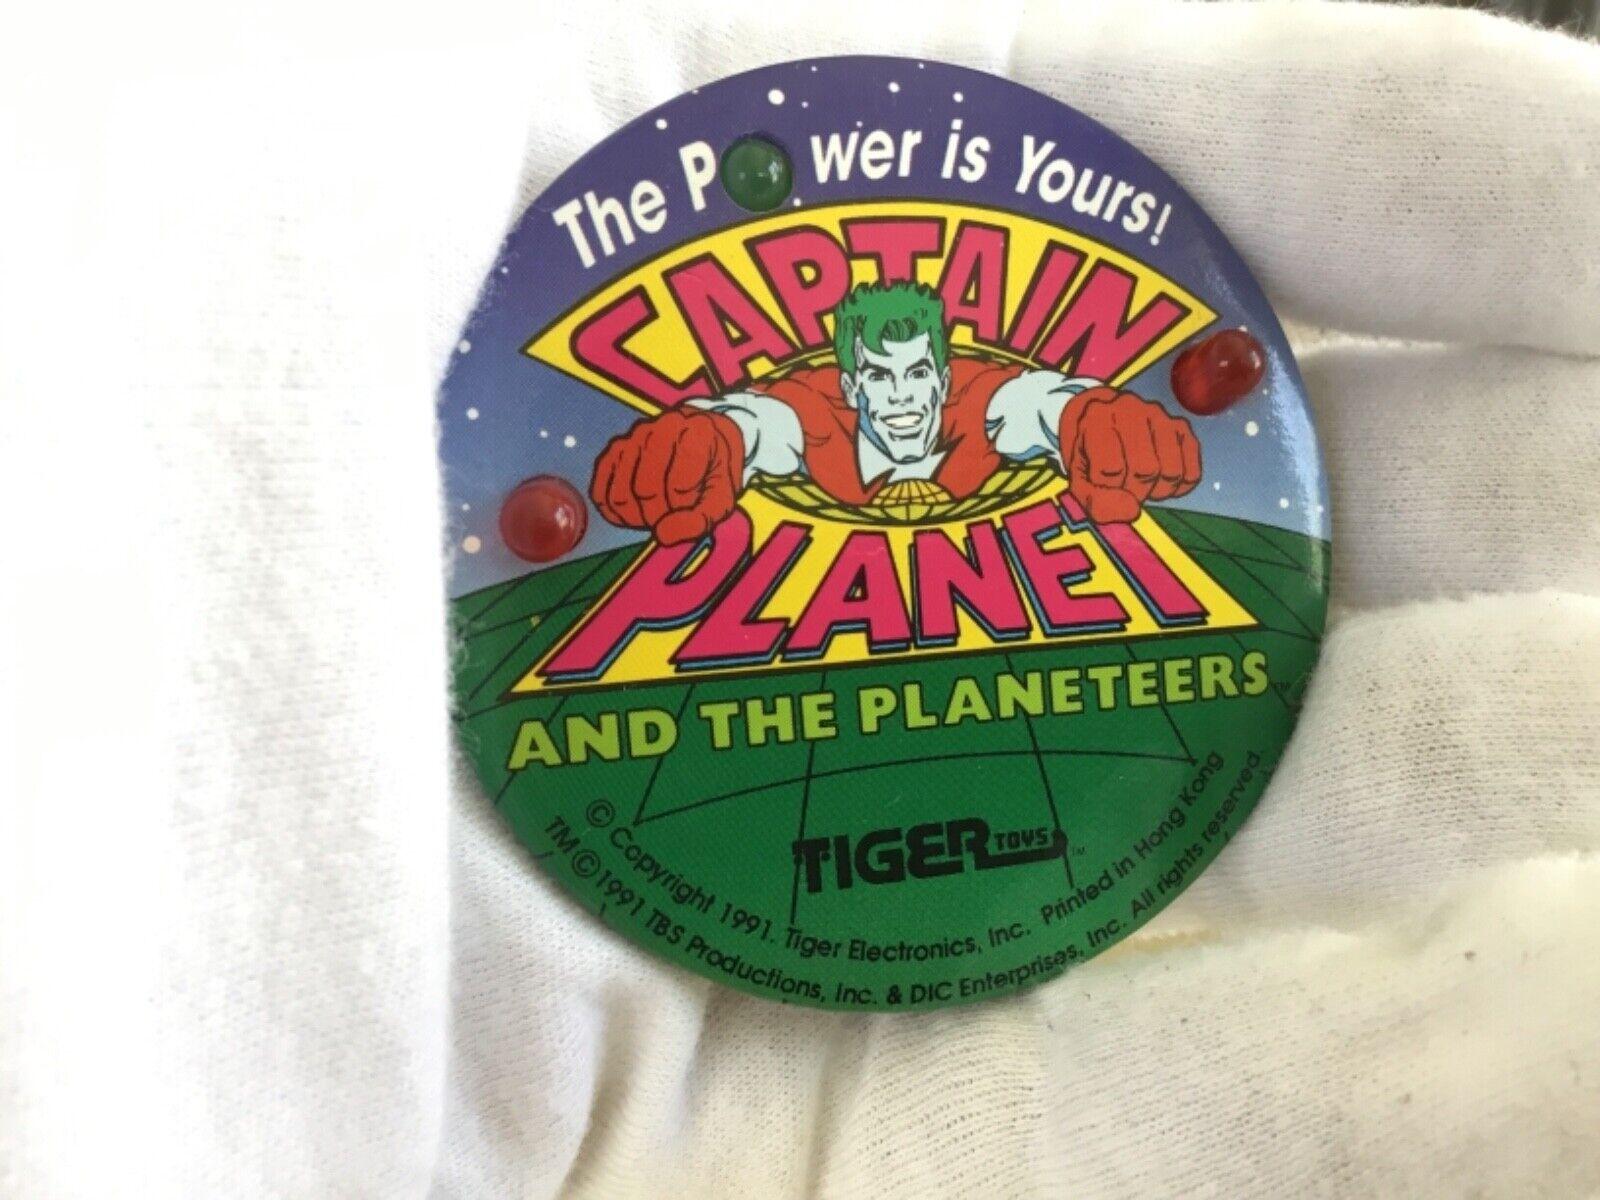 CAPTAIN PLANET LED ELECTRONIC LIGHT UP BUTTON TIGER TOYS 1991 VINTAGE